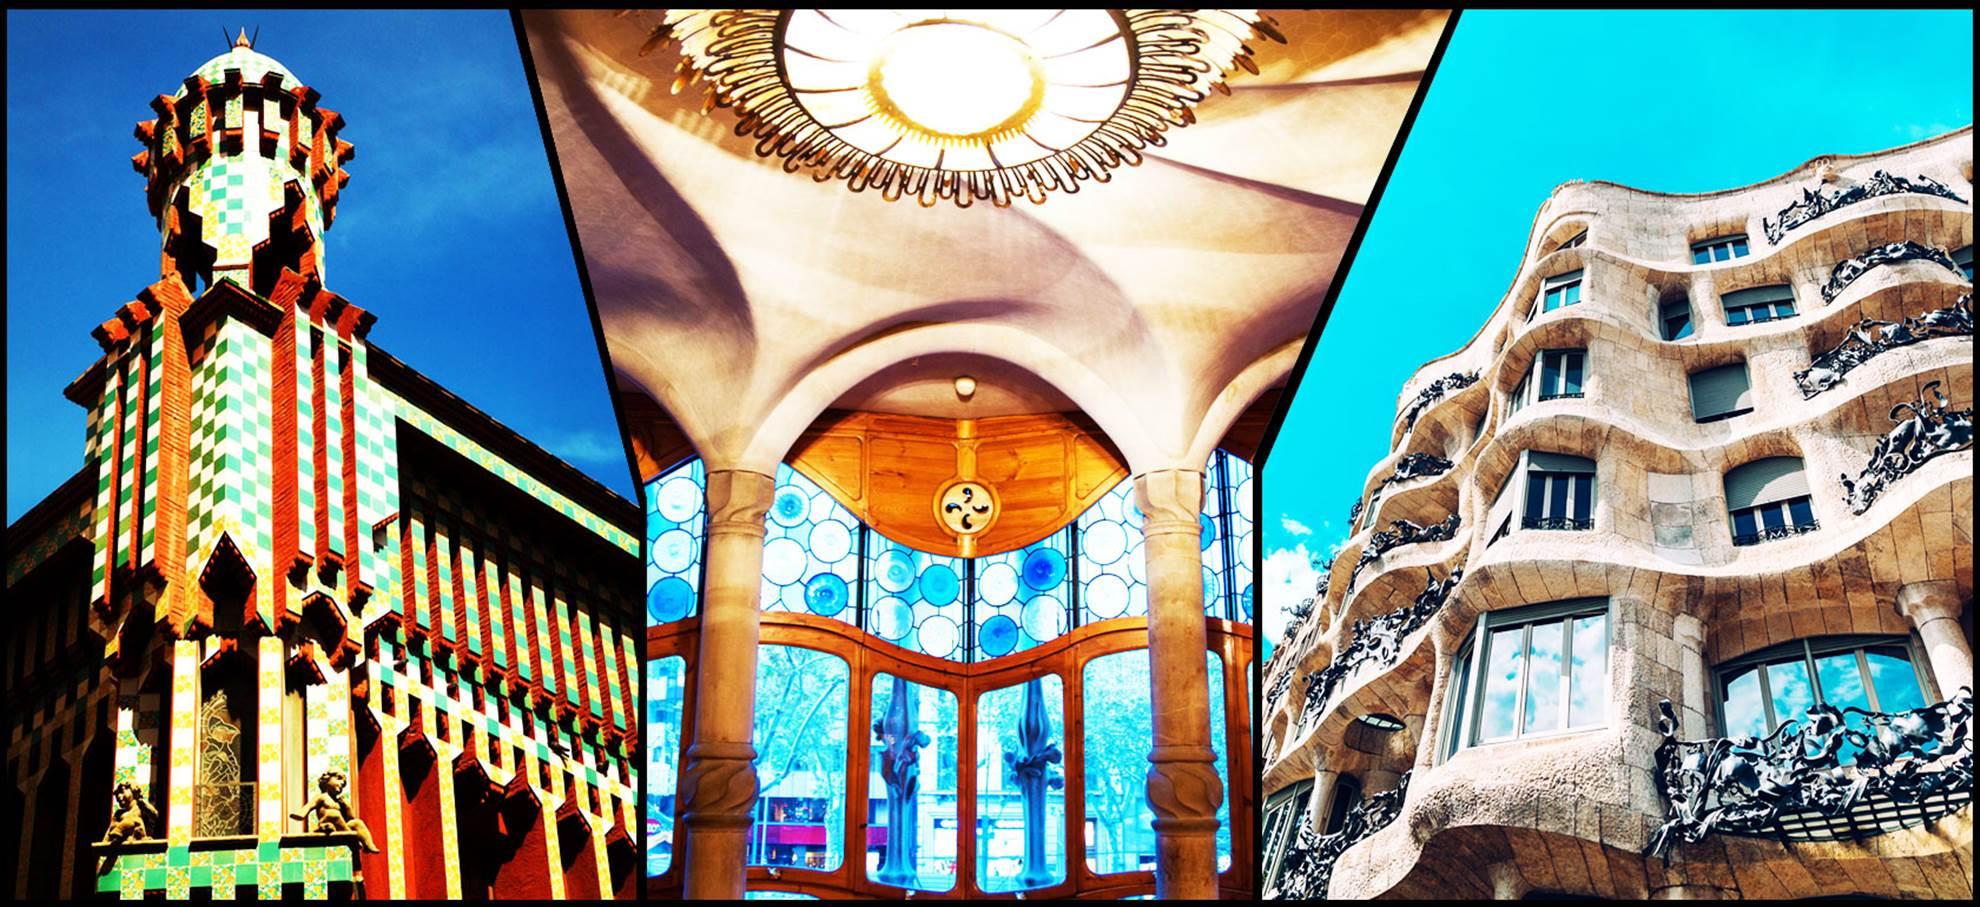 Les 3 Maisons de Gaudi: billets coupe-file a la Casa Batllo, la Casa Mila et la Casa Vicens !